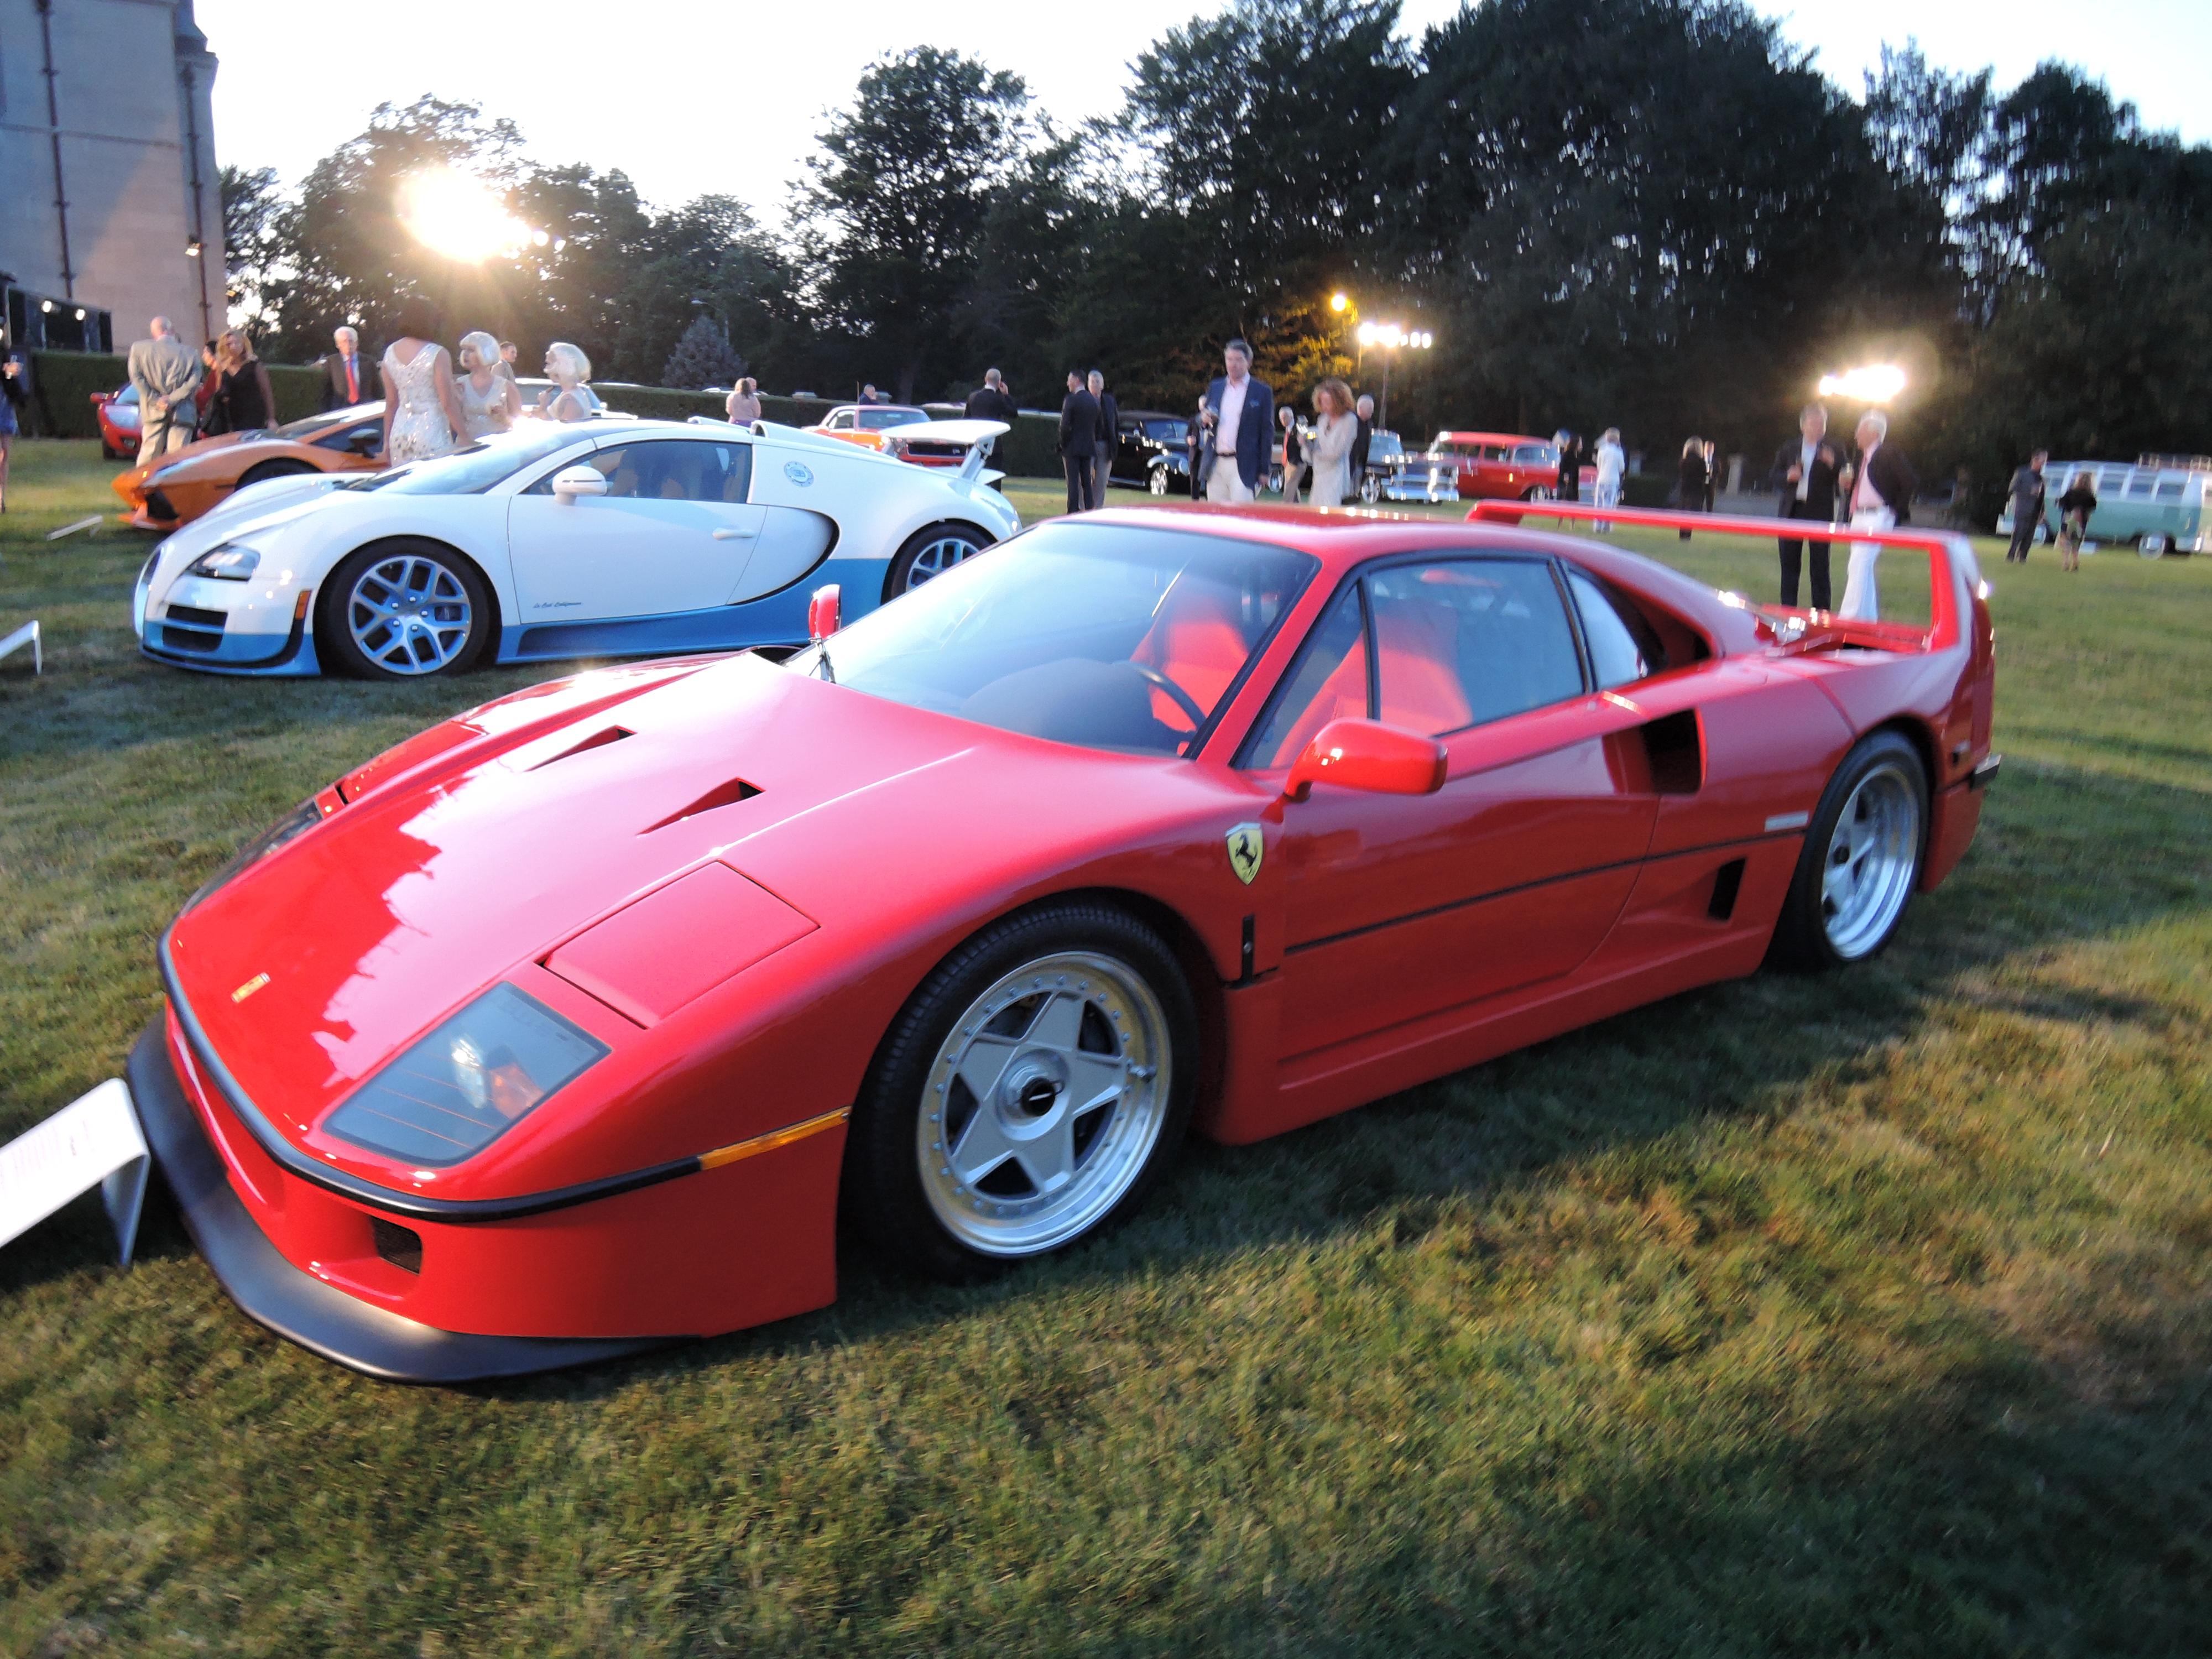 red 1991 Ferrari F40 - Audrain Auto Museum Gala 2017